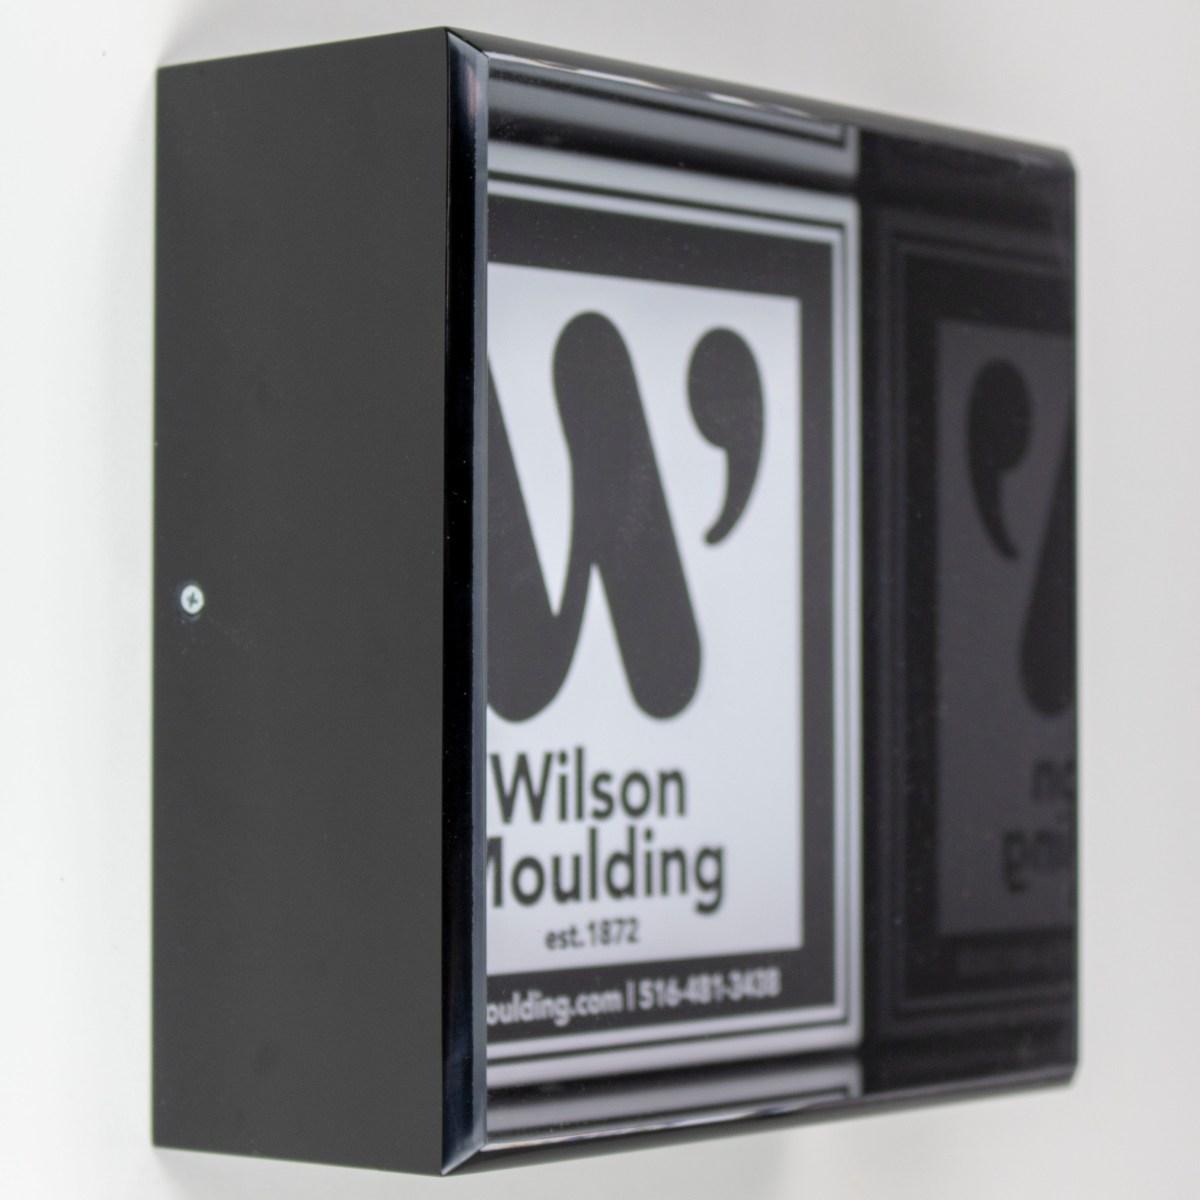 Black Acrylic Box - Wilson Moulding